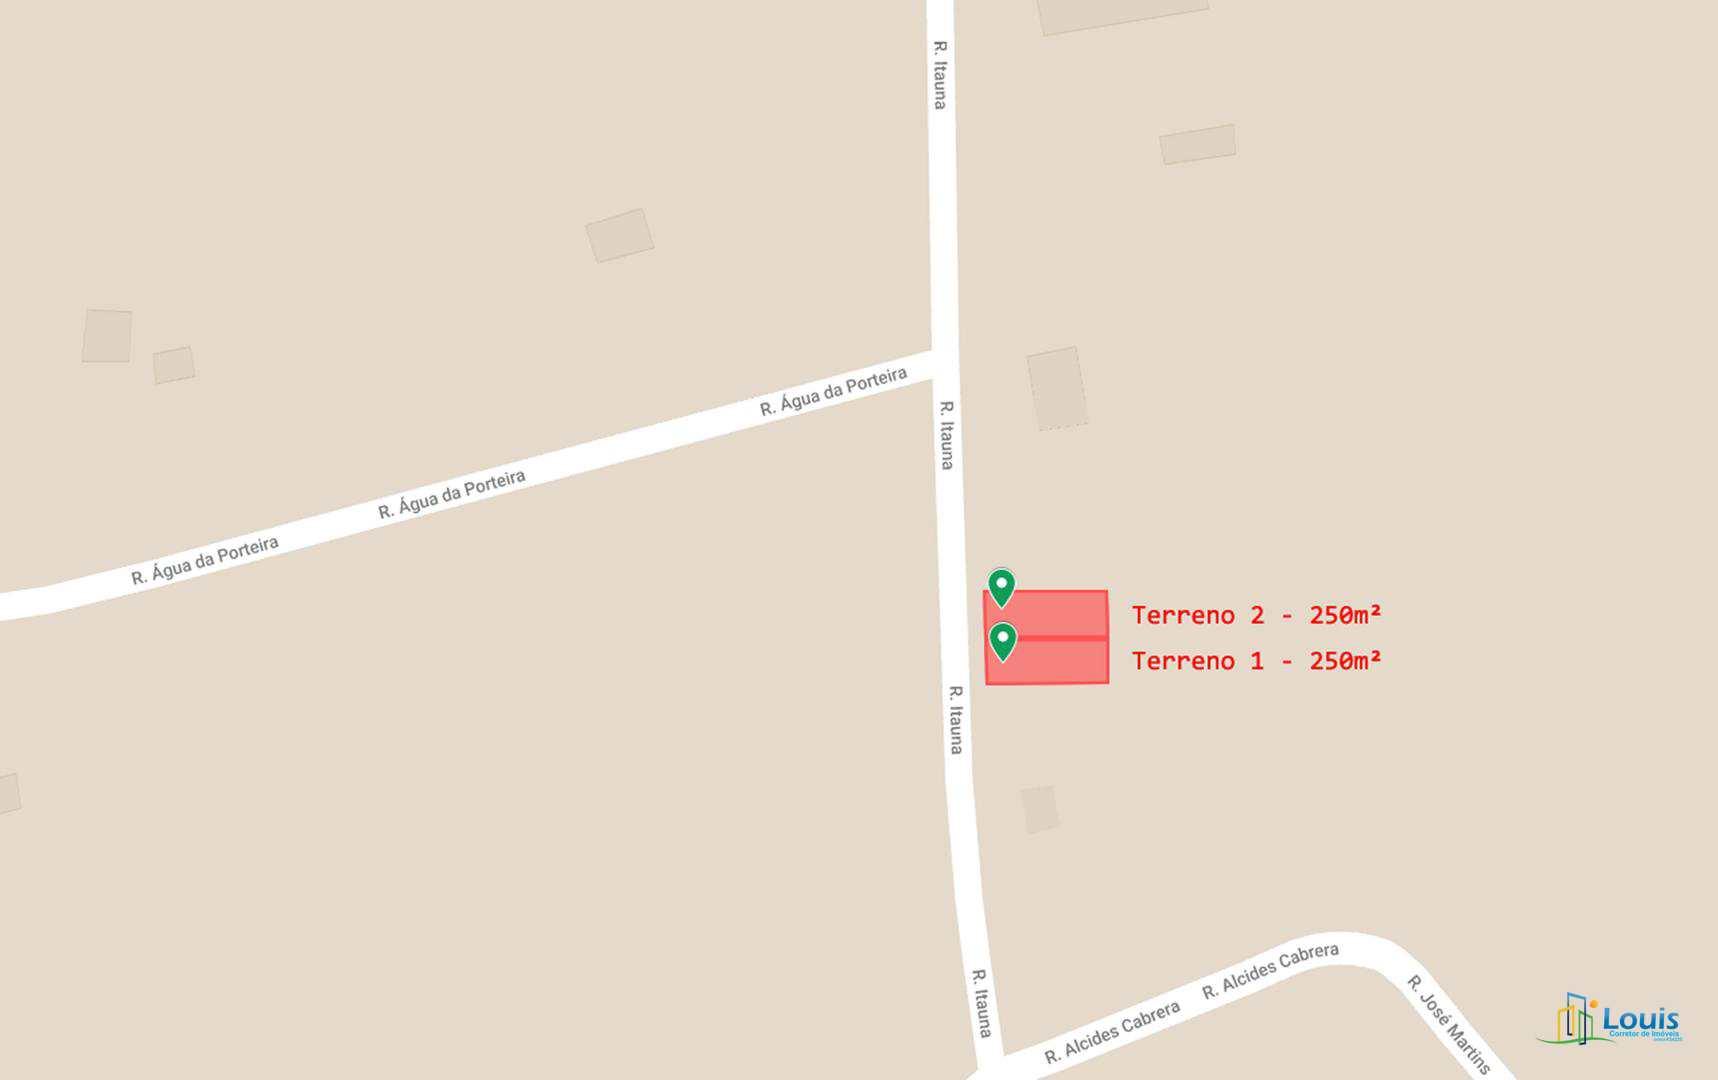 Terreno 250m² (LT 13), Recanto Alvorada, Ibiporã/PR